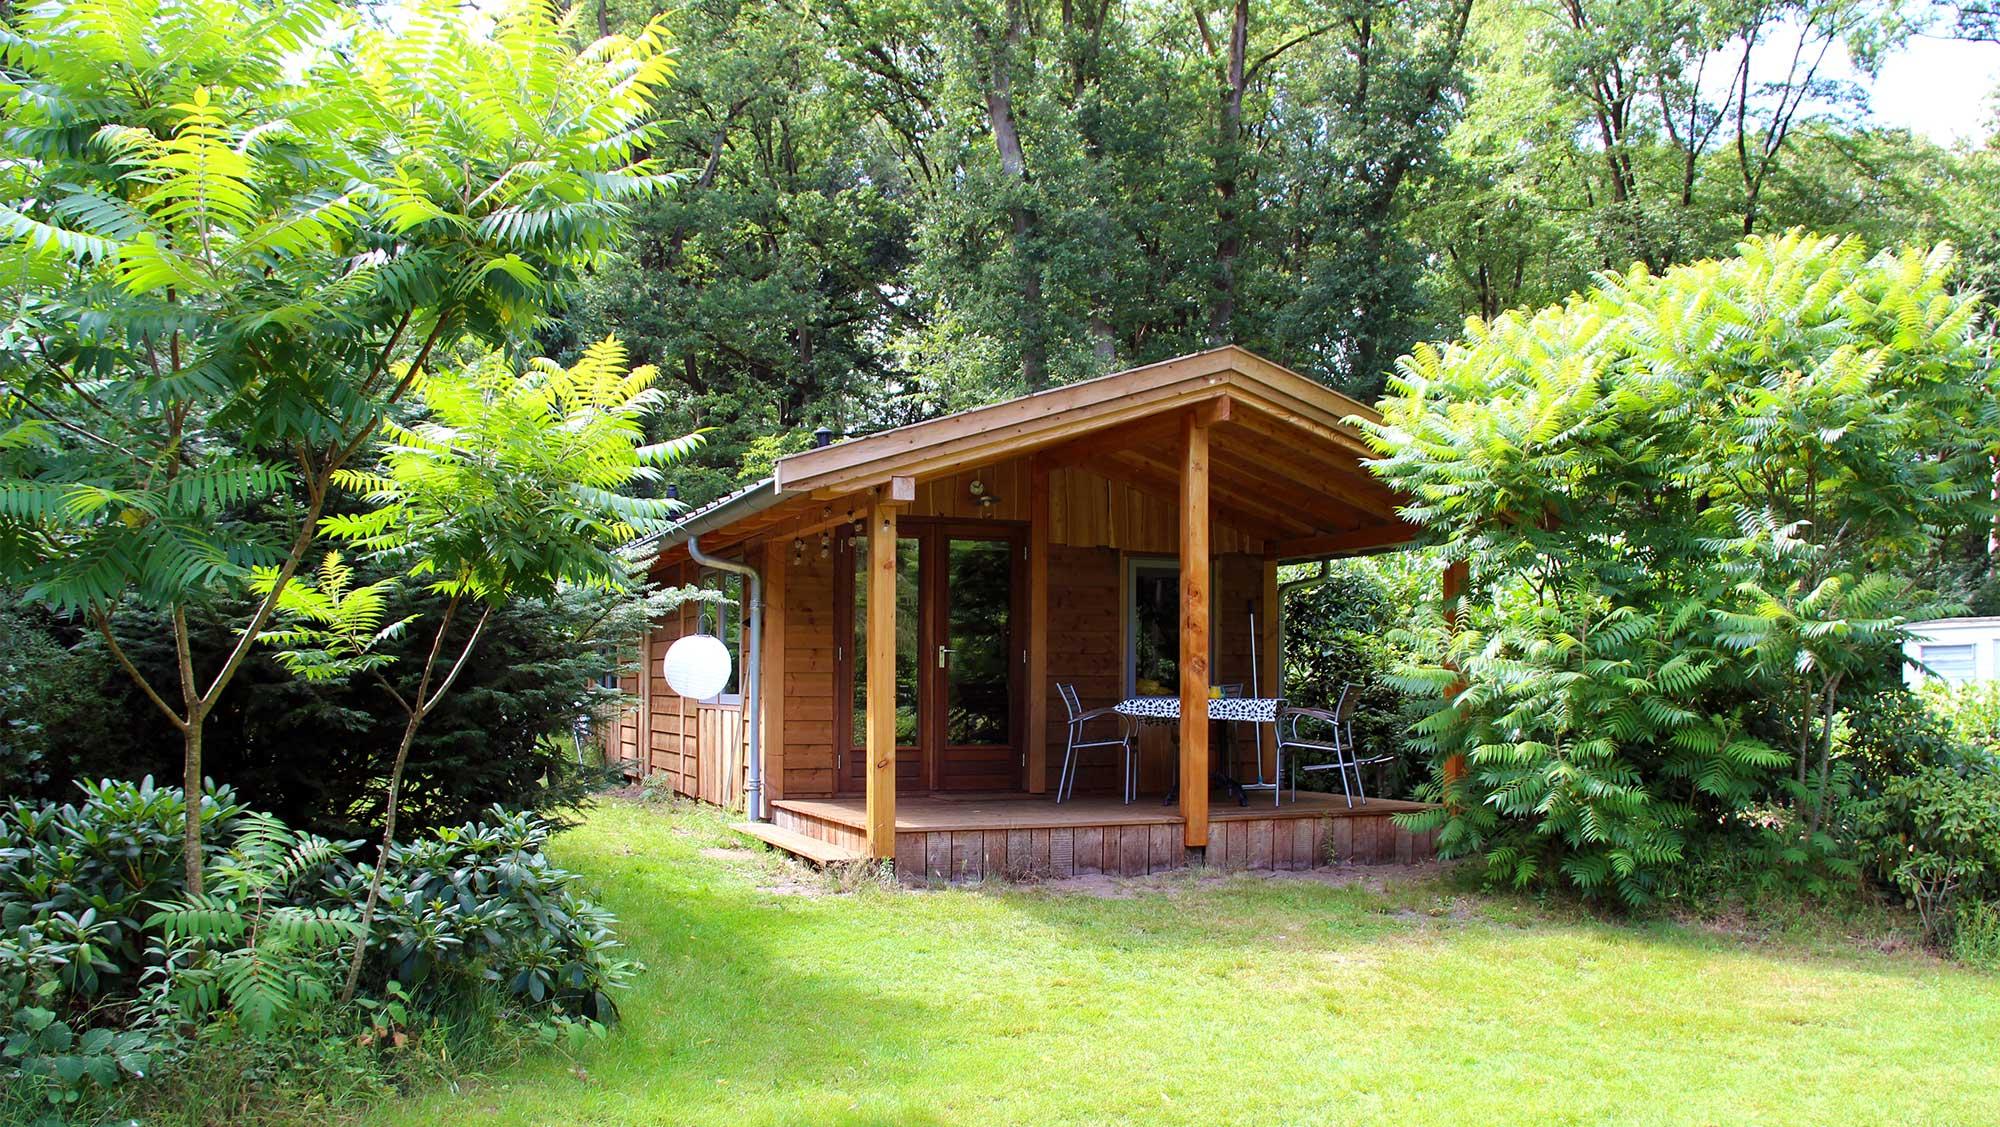 4pers bungalow Goudvink Molecaten Park Landgoed Molecaten 01